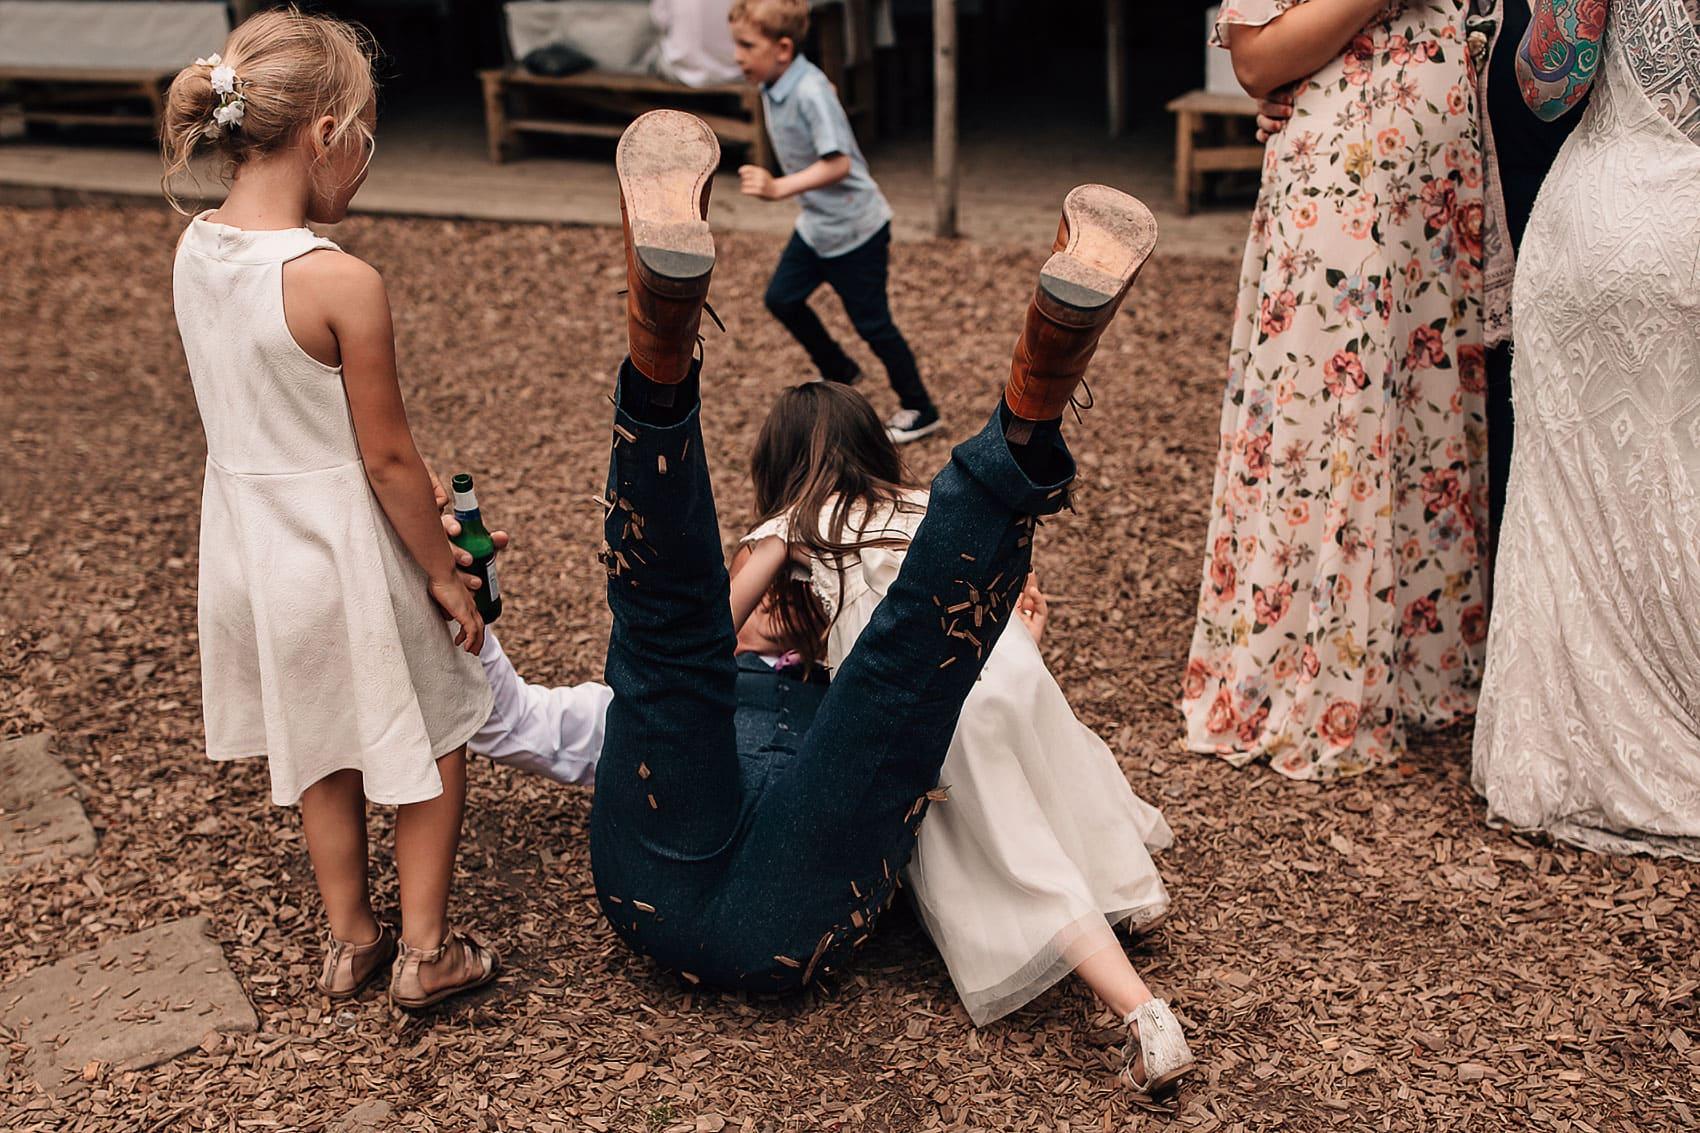 forest wedding dance-floor woodland